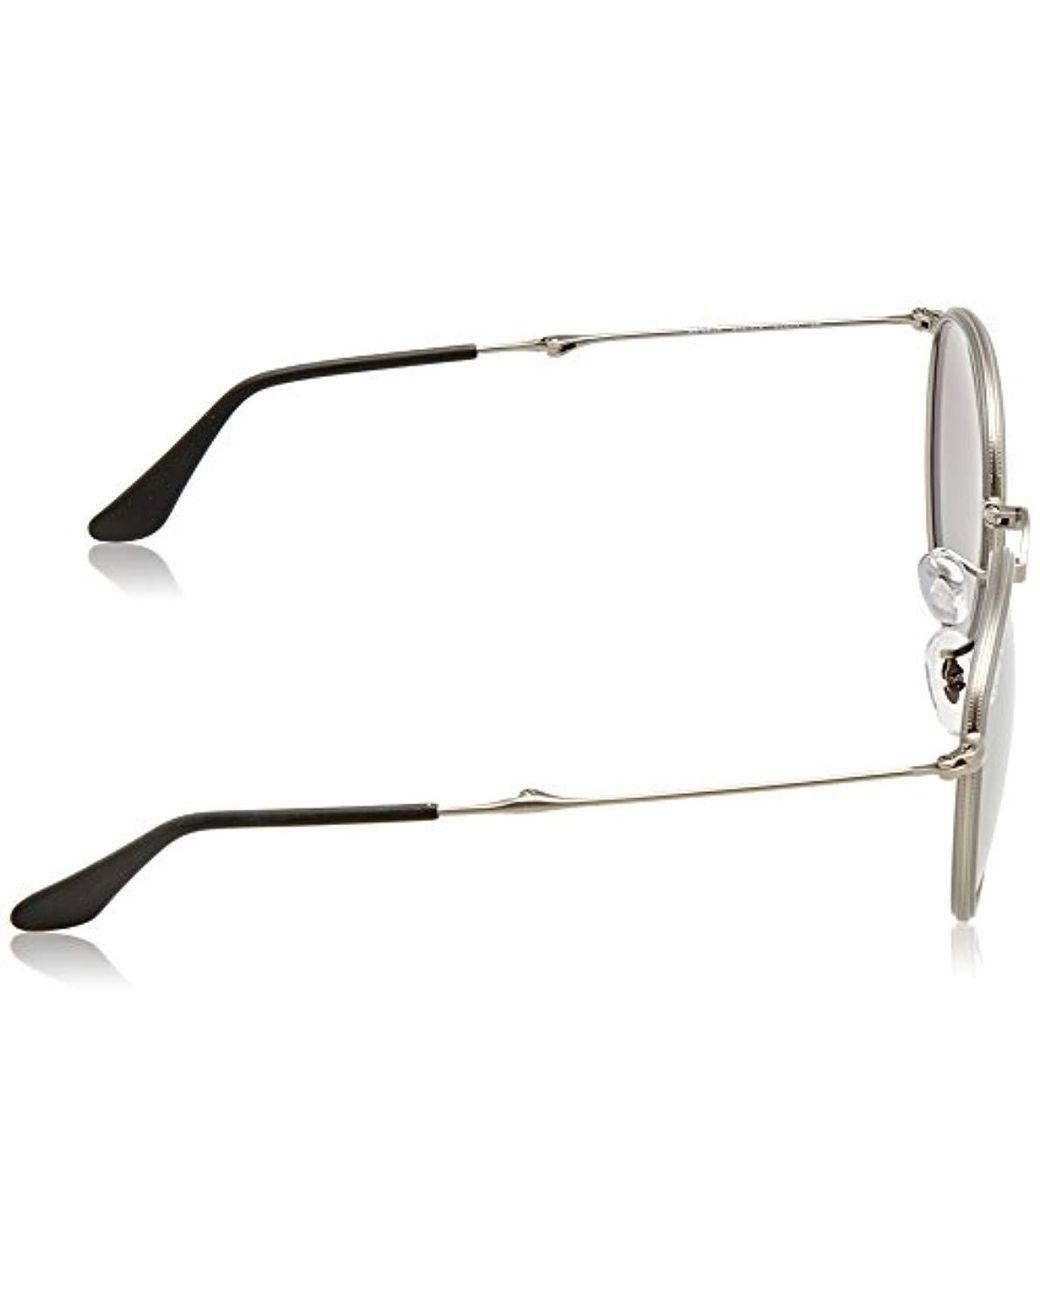 f59b0170b774 Ray-Ban Rb3517 Round Folding Metal Sunglasses, Matte Gunmetal/polarized  Grey Gradient Mirror, 51 Mm in Gray for Men - Lyst